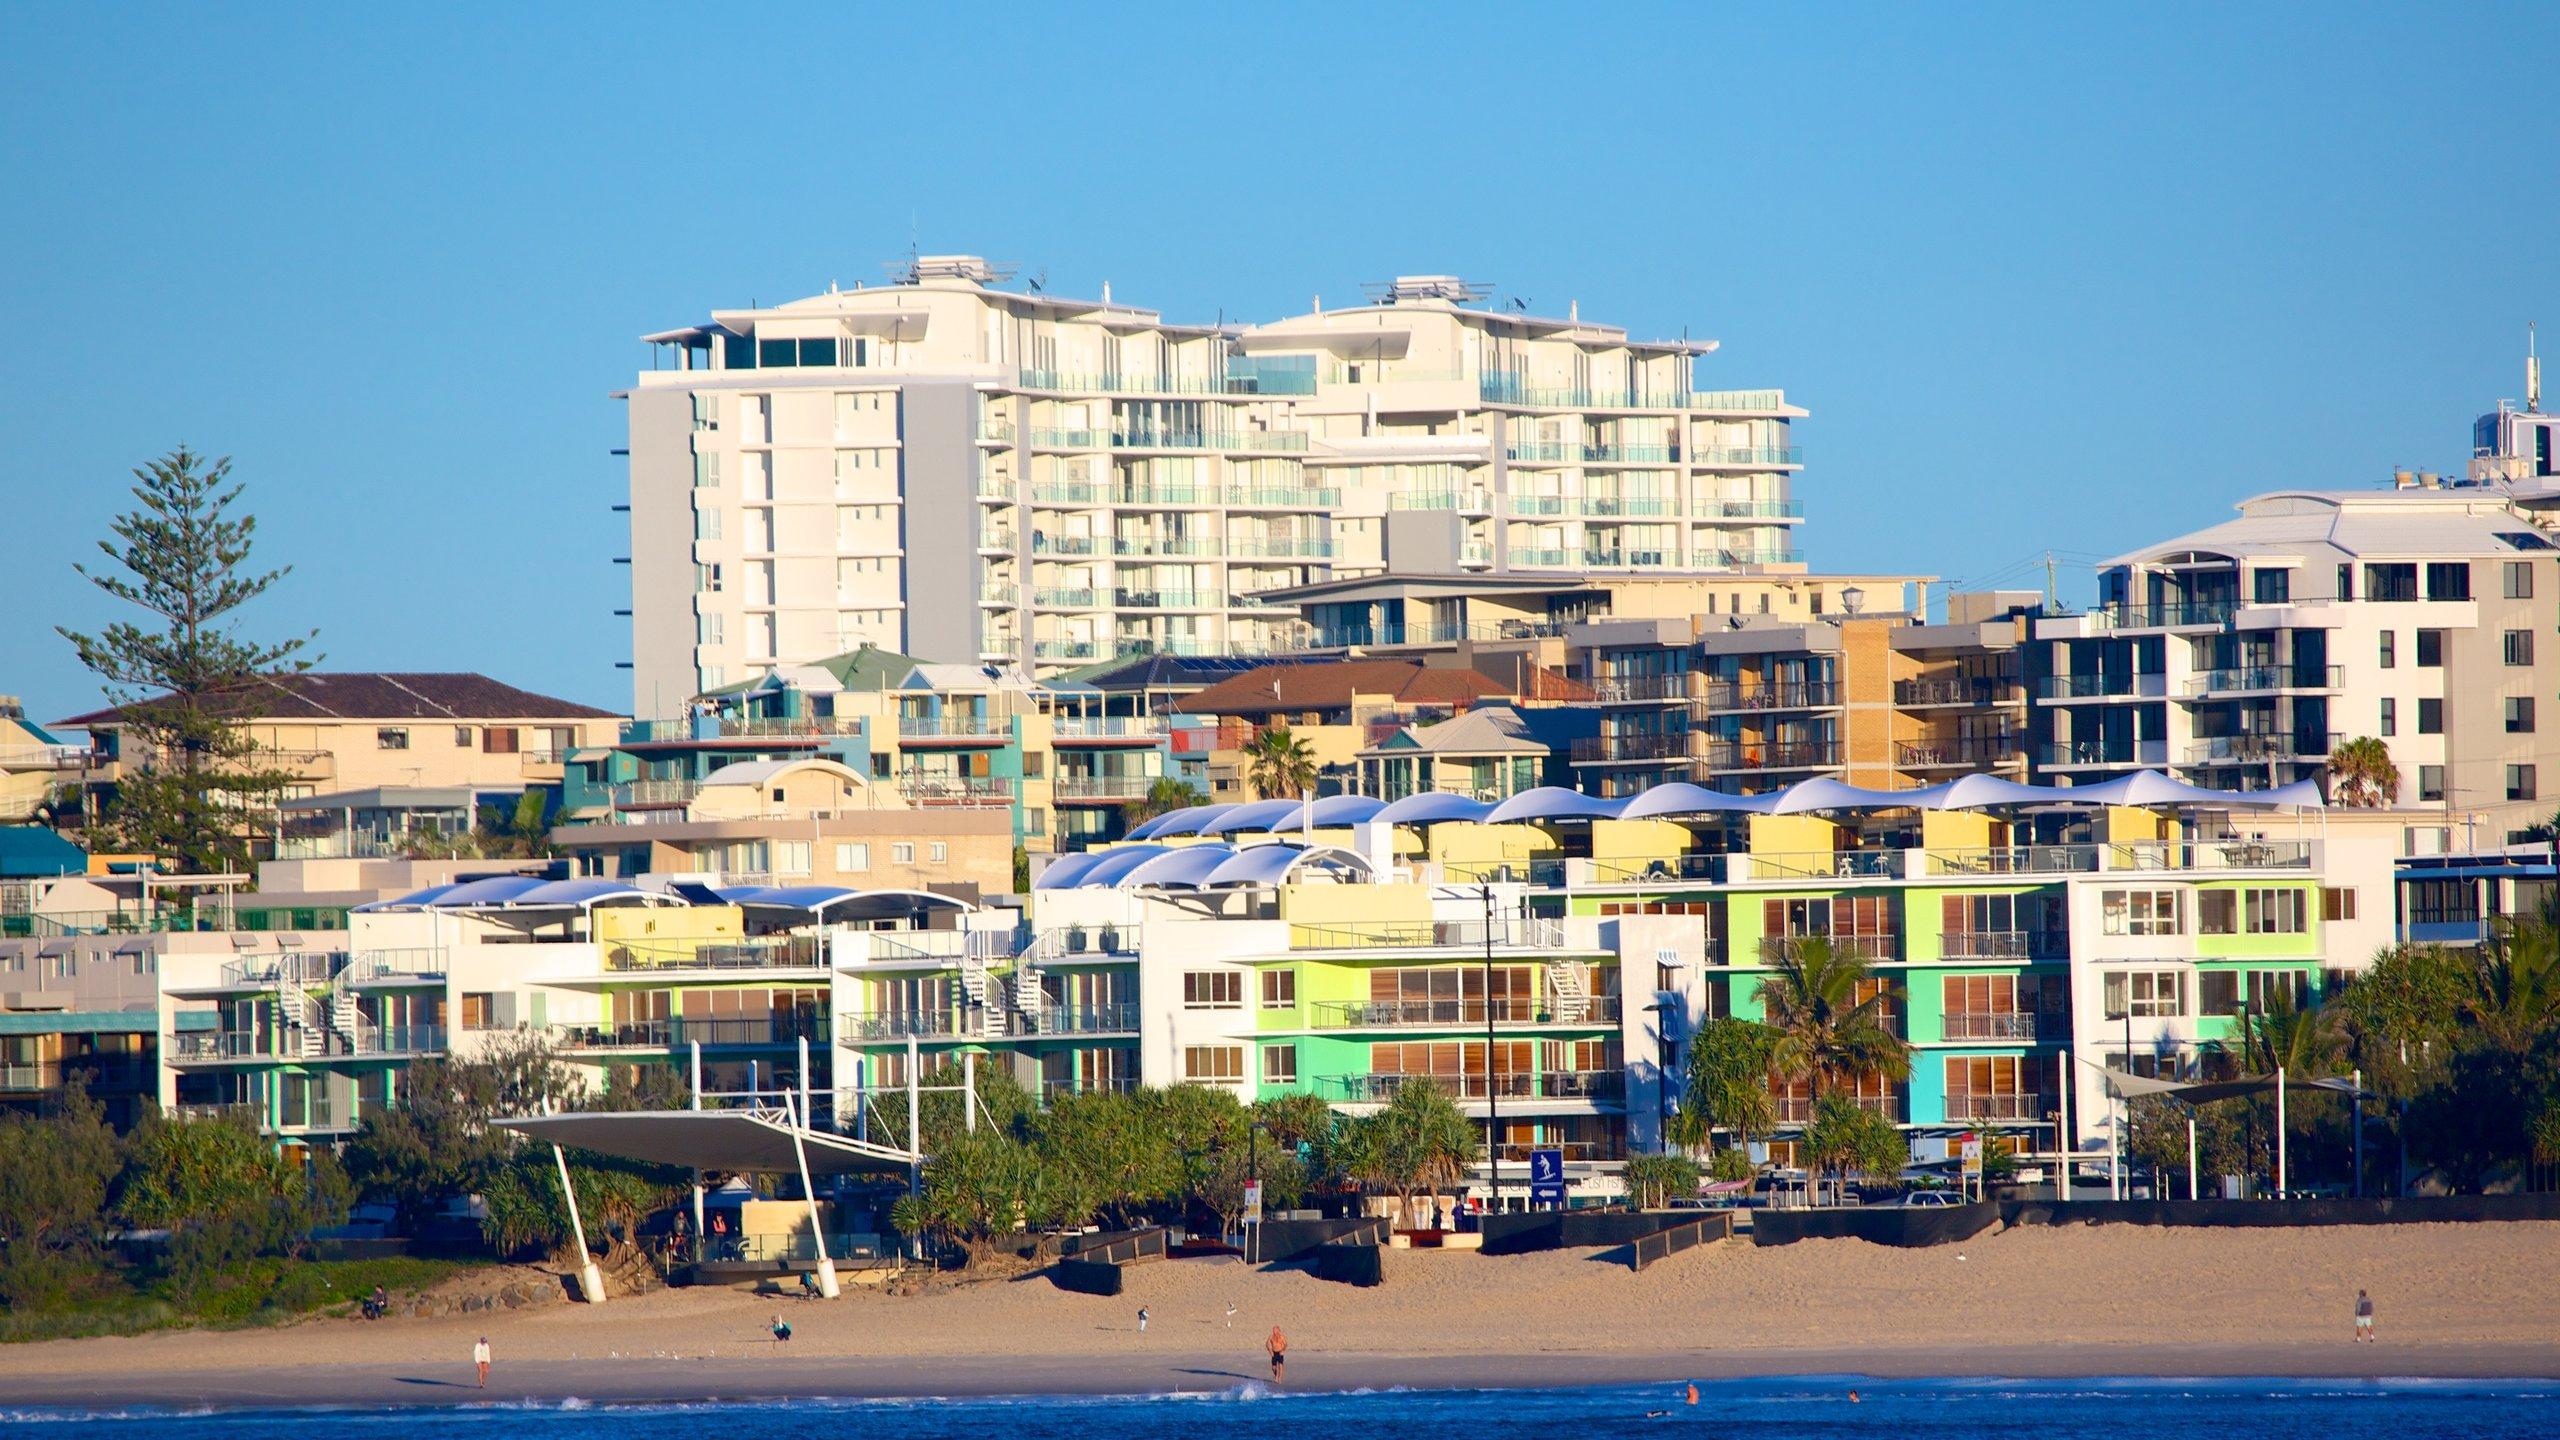 Kings Beach, Sunshine Coast, Queensland, Australia